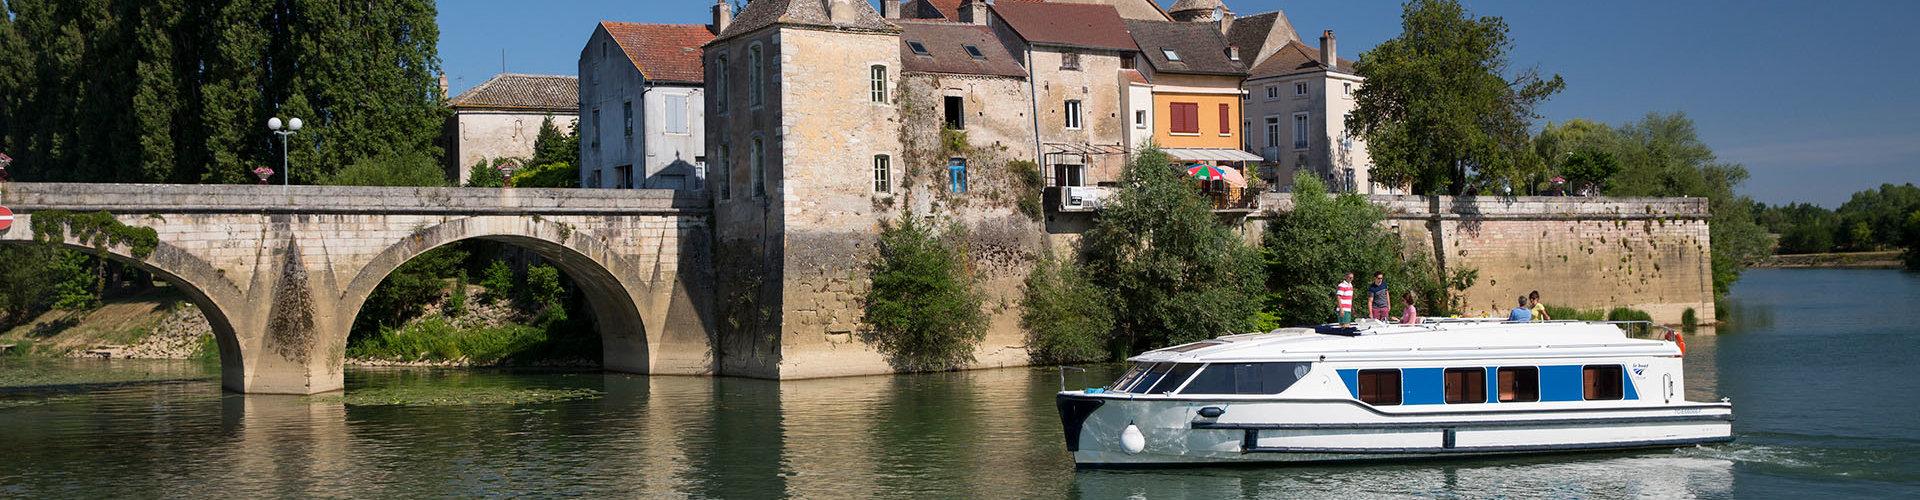 Vision in Burgundy